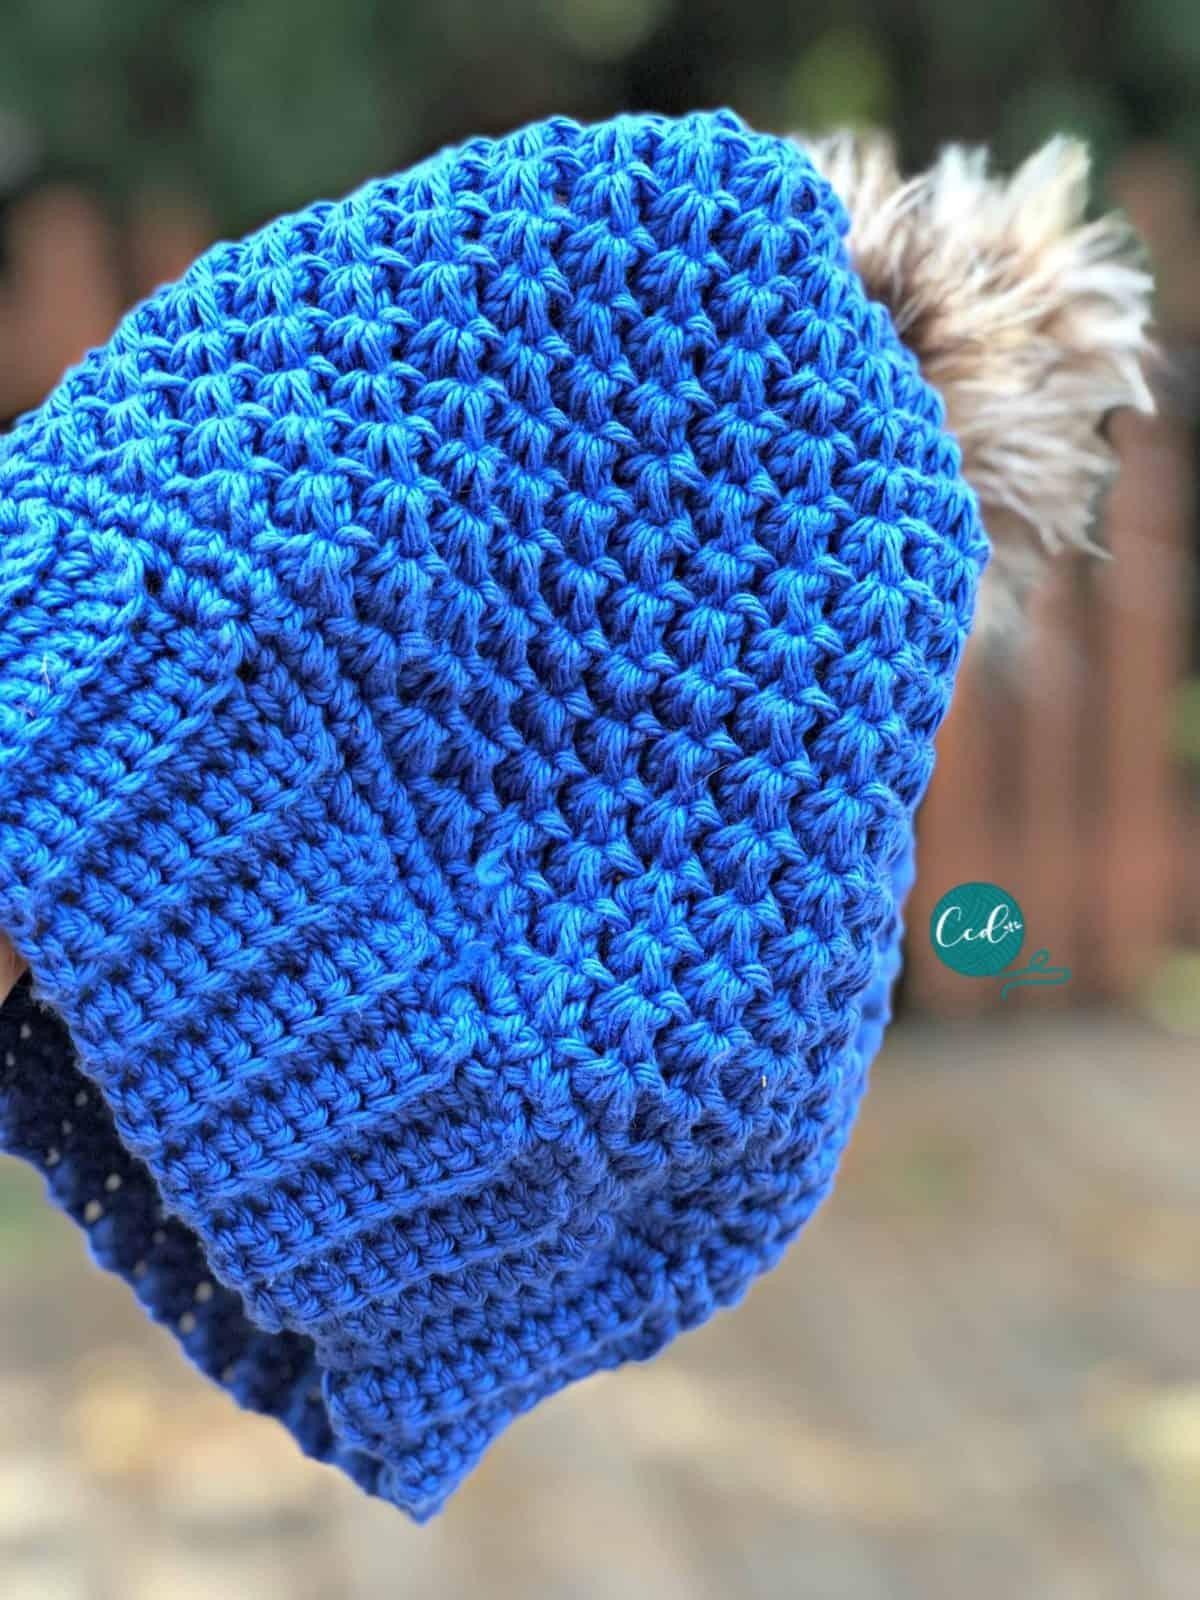 Blue crochet pom hat close up texture.